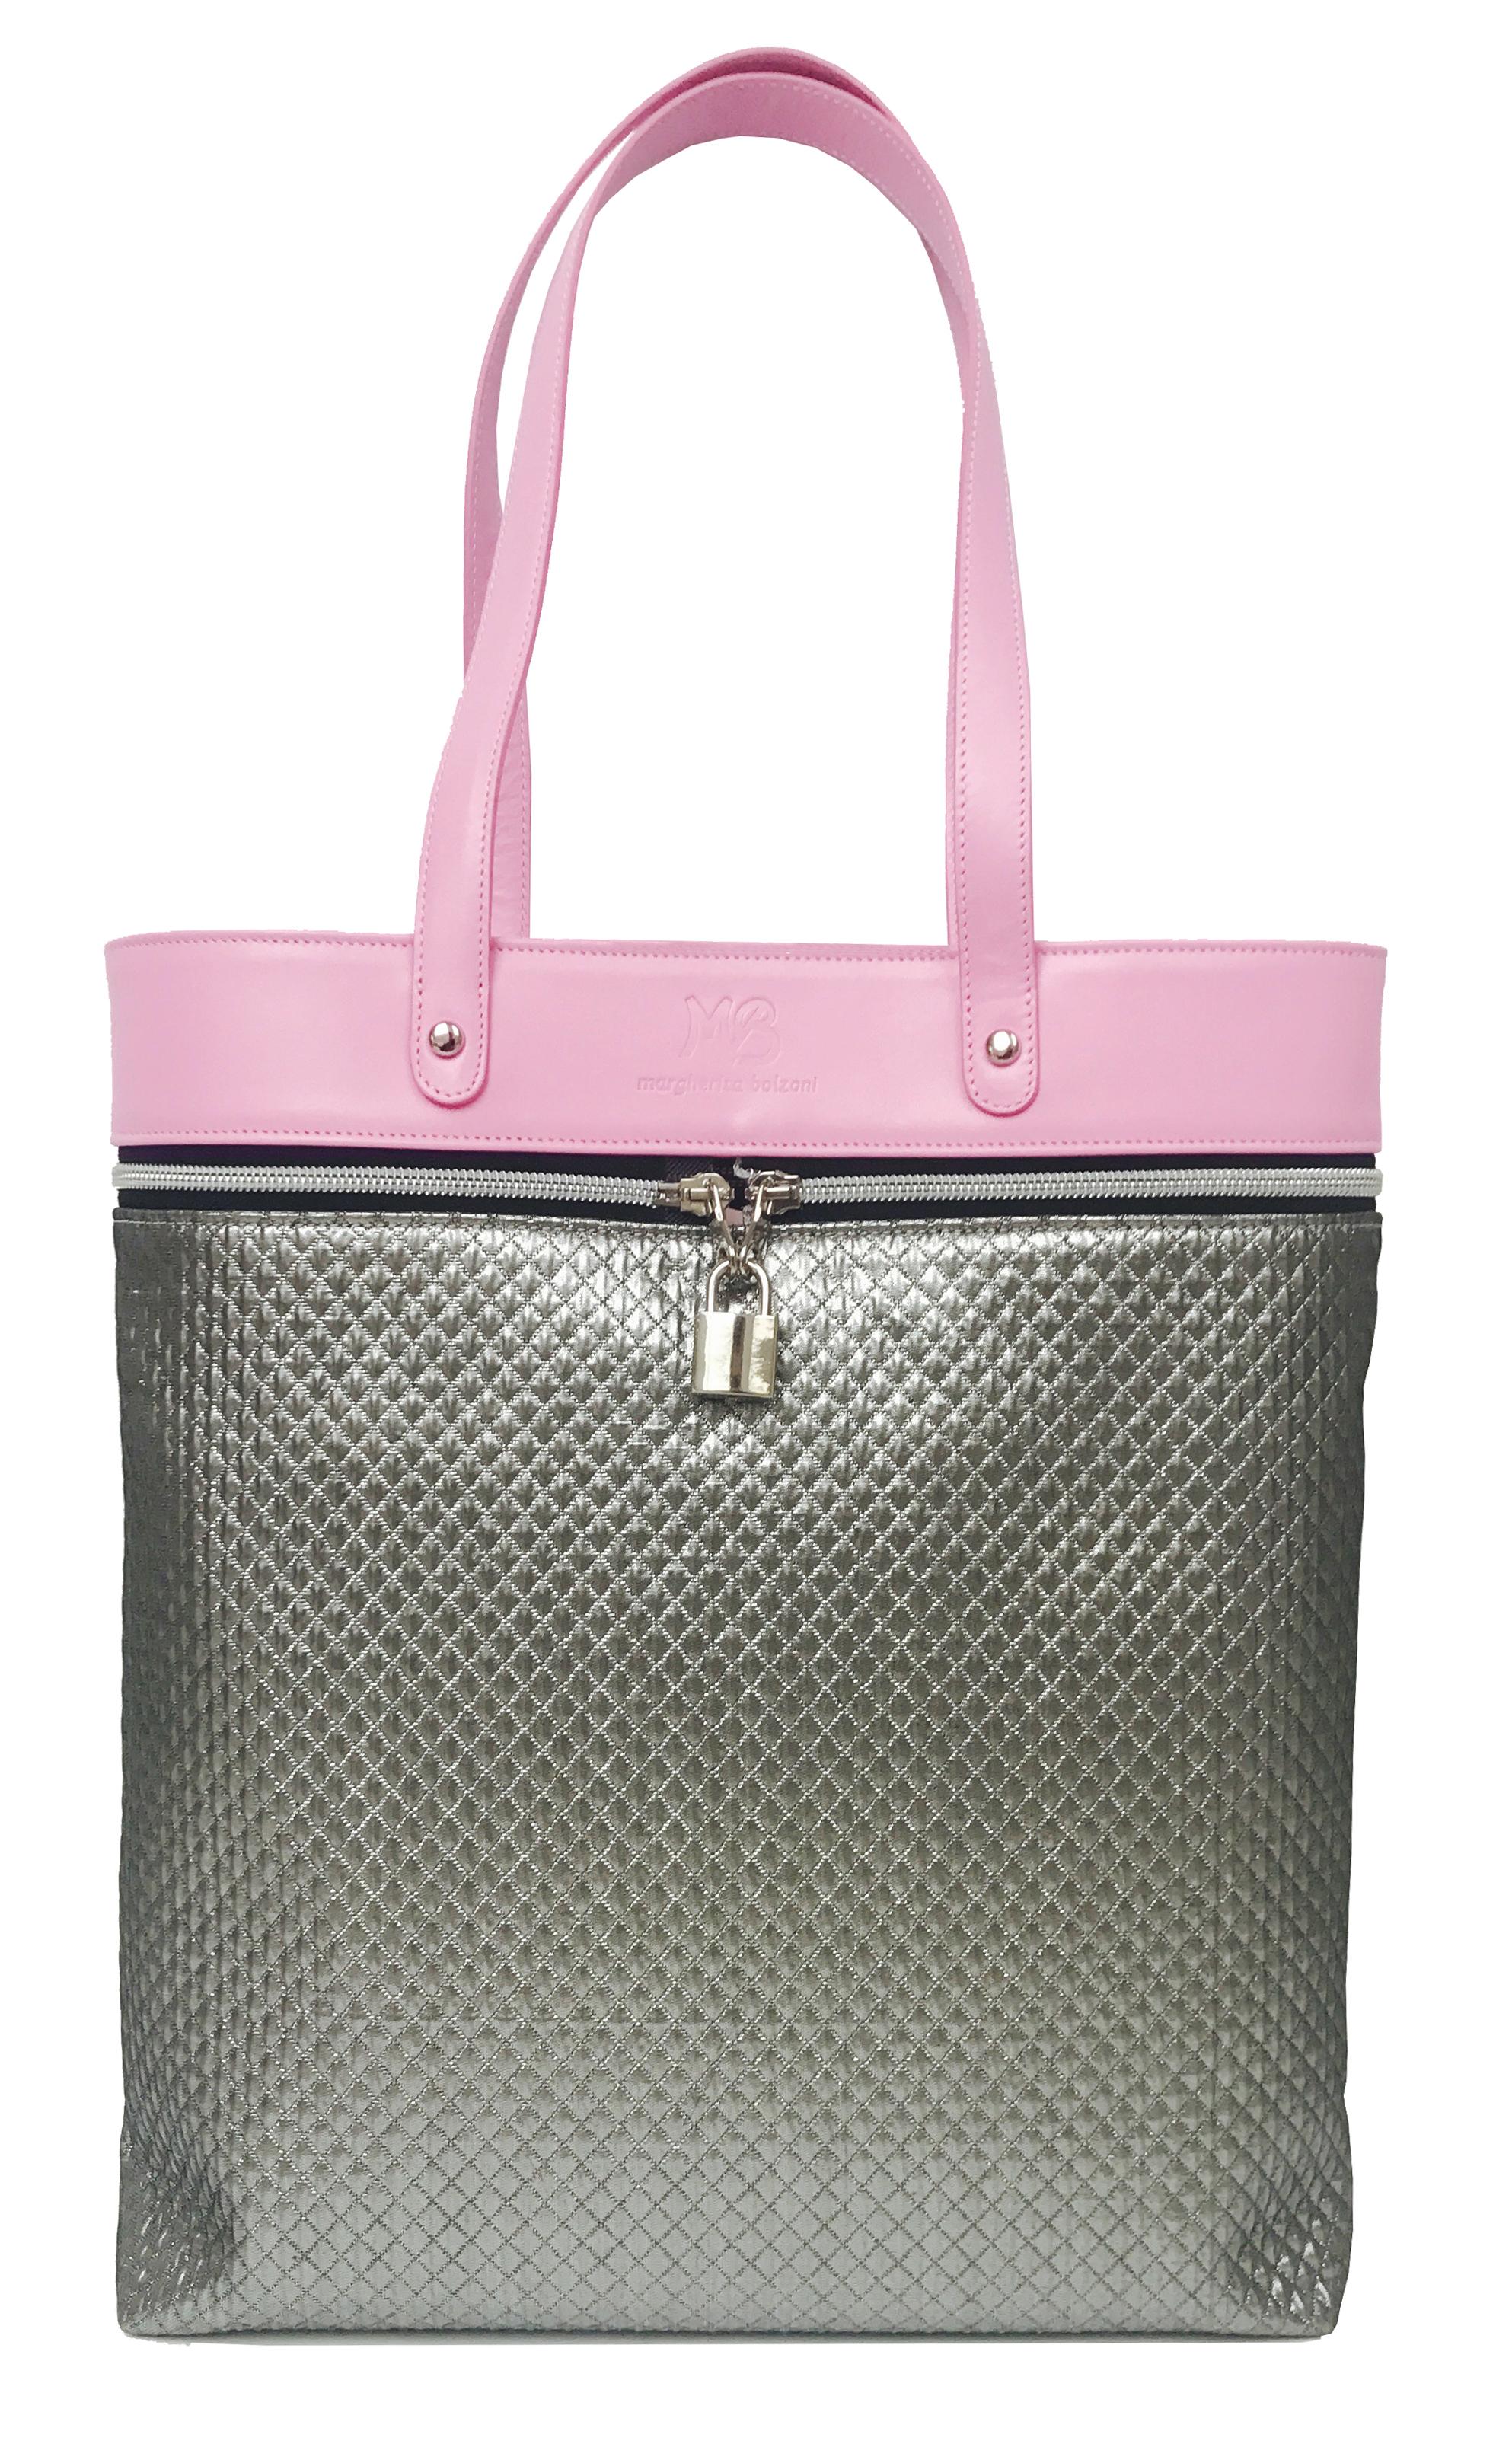 BE WRIGHT TOTEDIMENSIONS:32x36x10cmMATERIALS: Italian Leather & Textile.ACCESSORIES COLOUR:Silver -